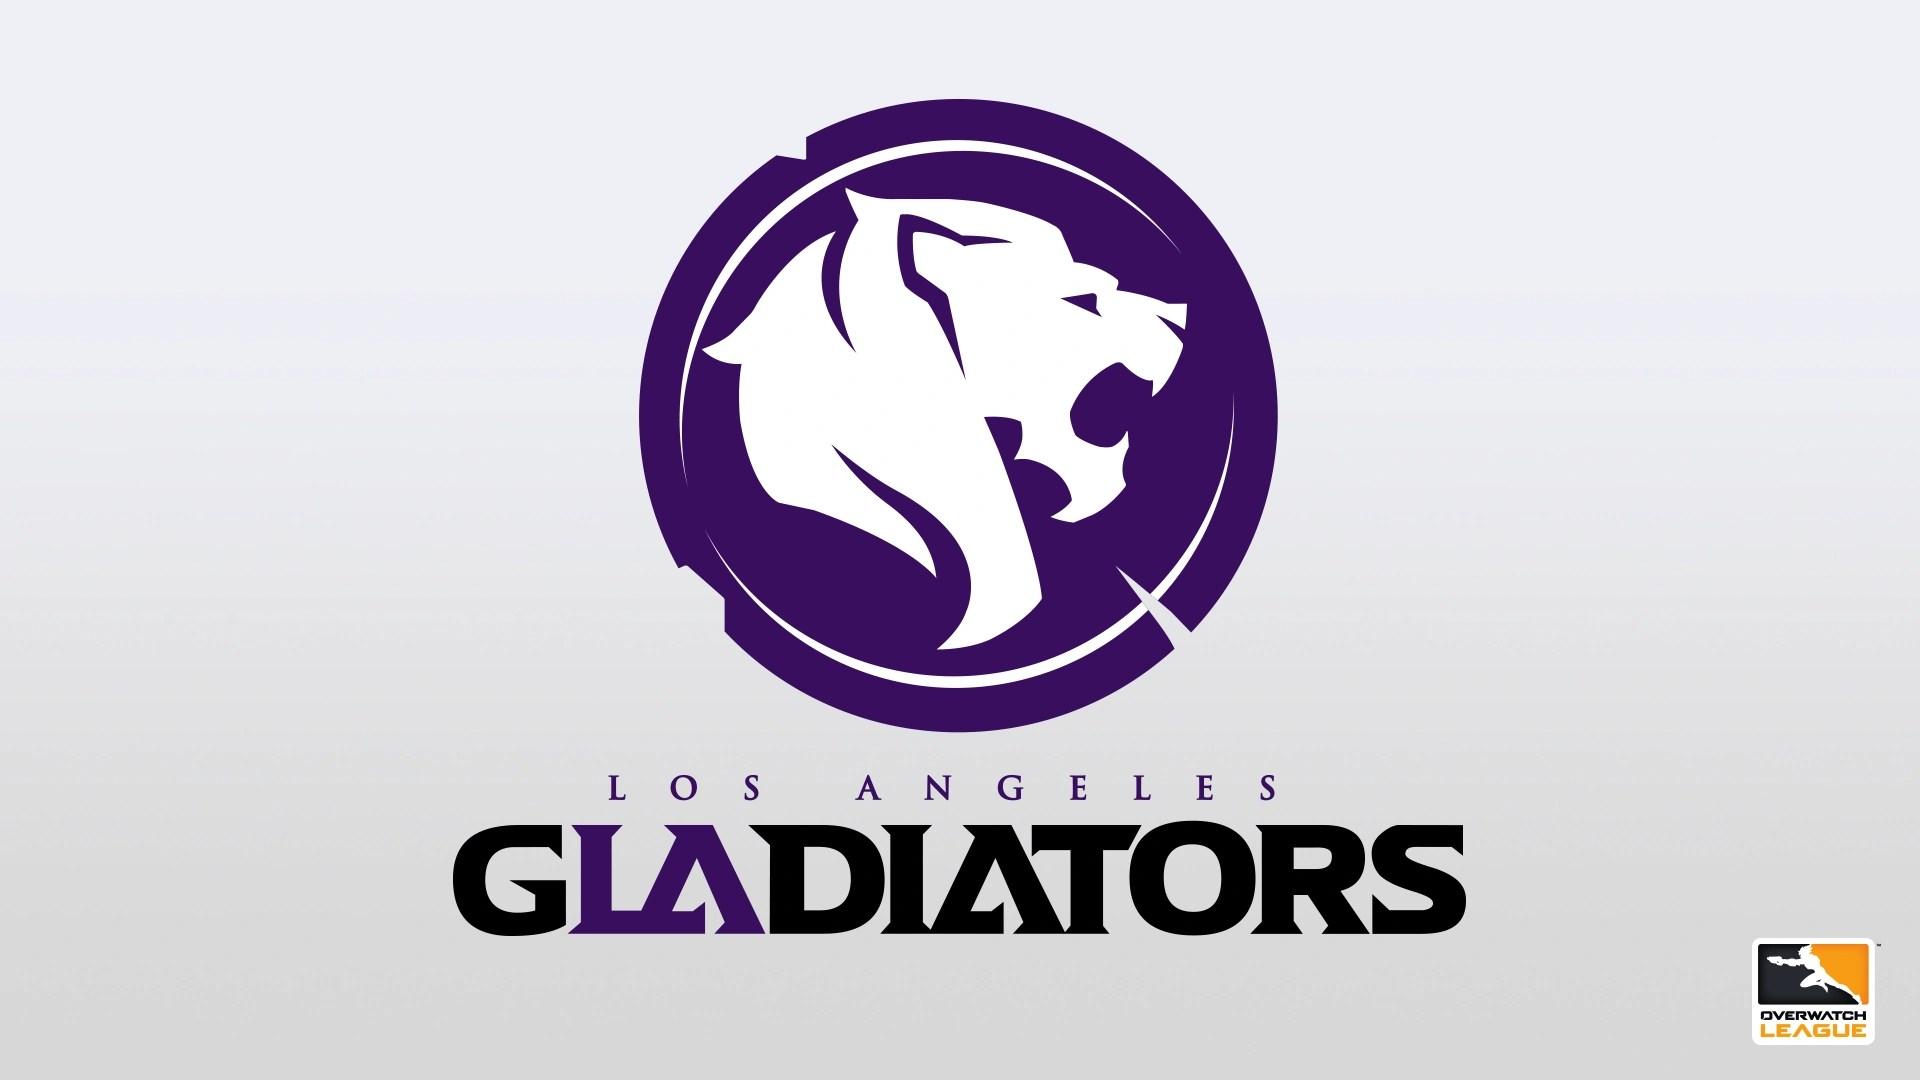 Los Angeles Gladiators Overwatch Wiki FANDOM Powered